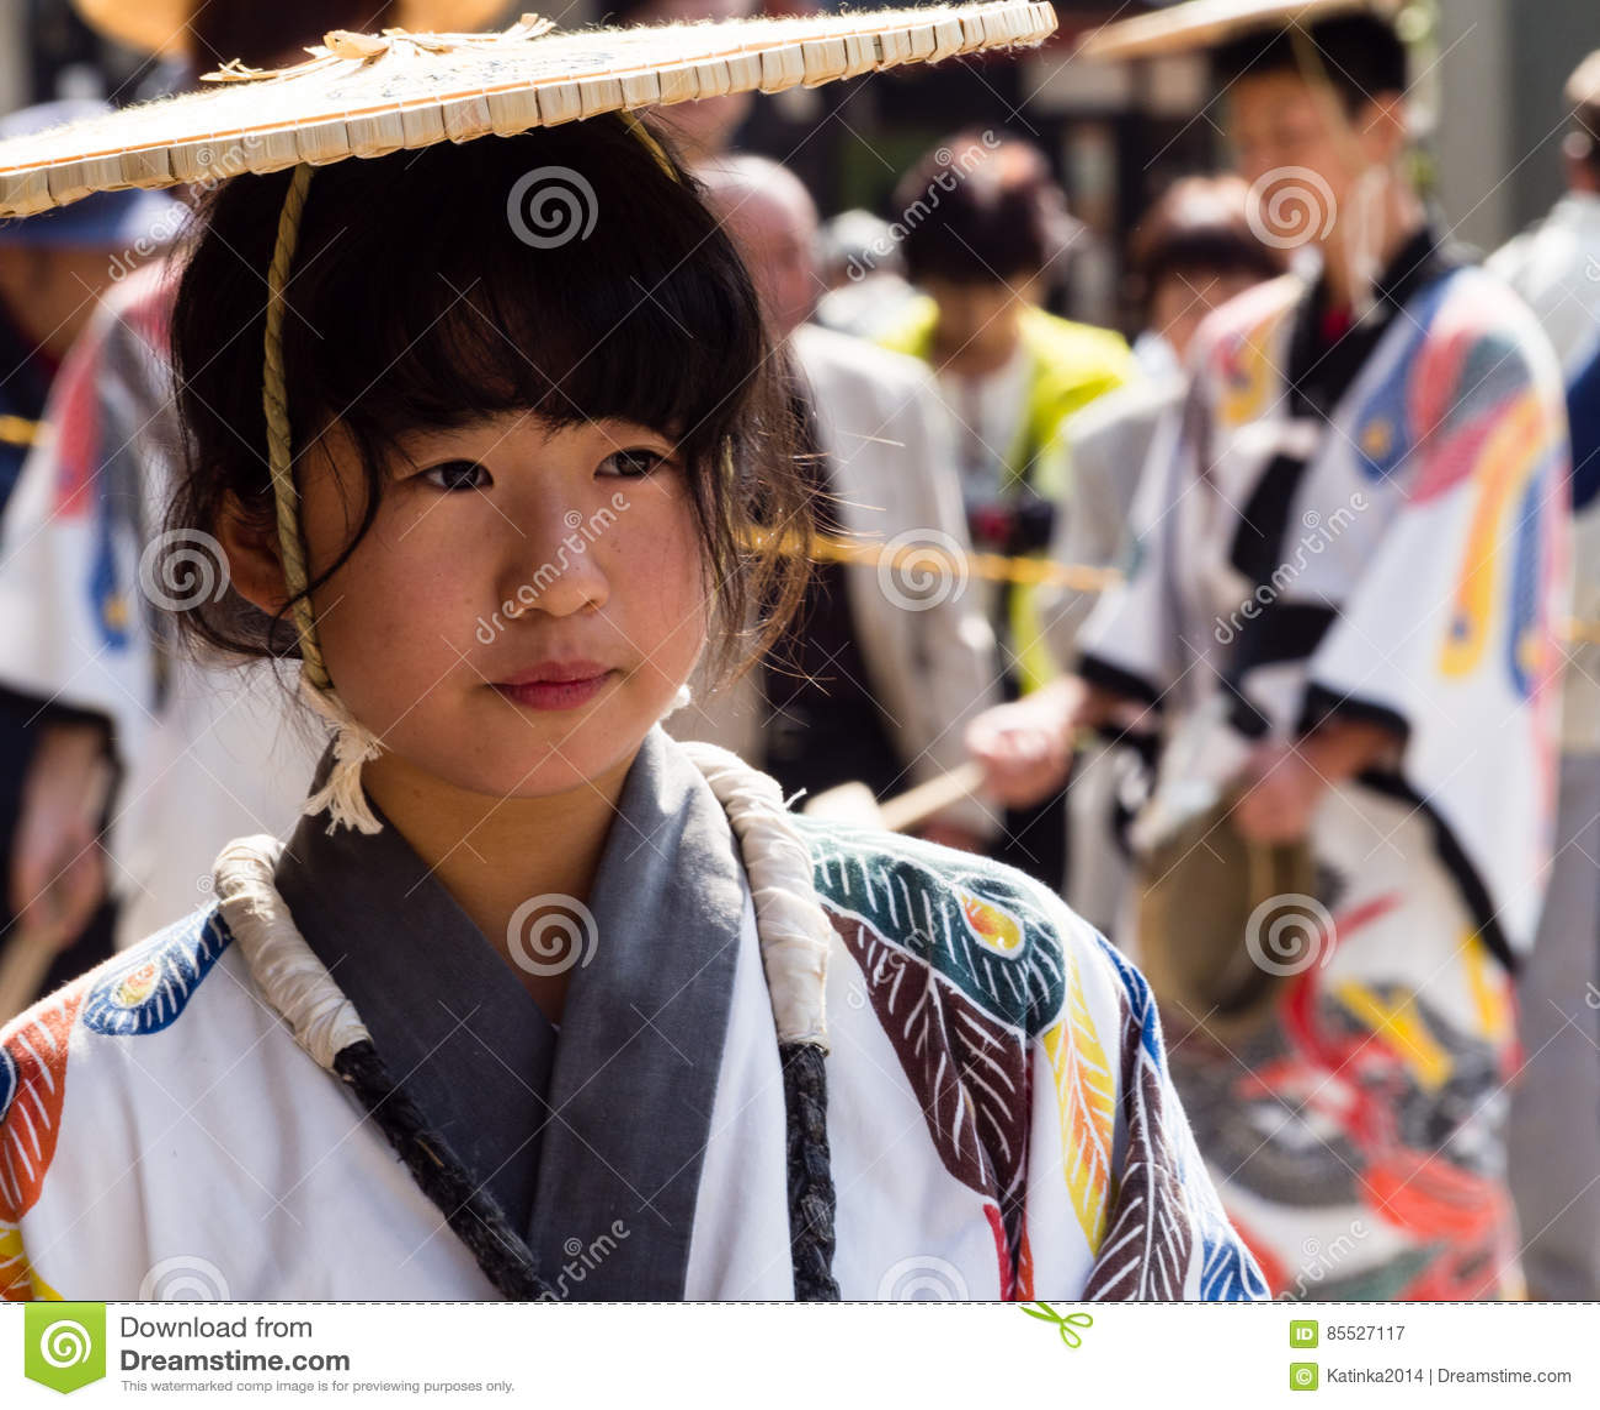 Japanese girl in traditional clothing at Takayama festival